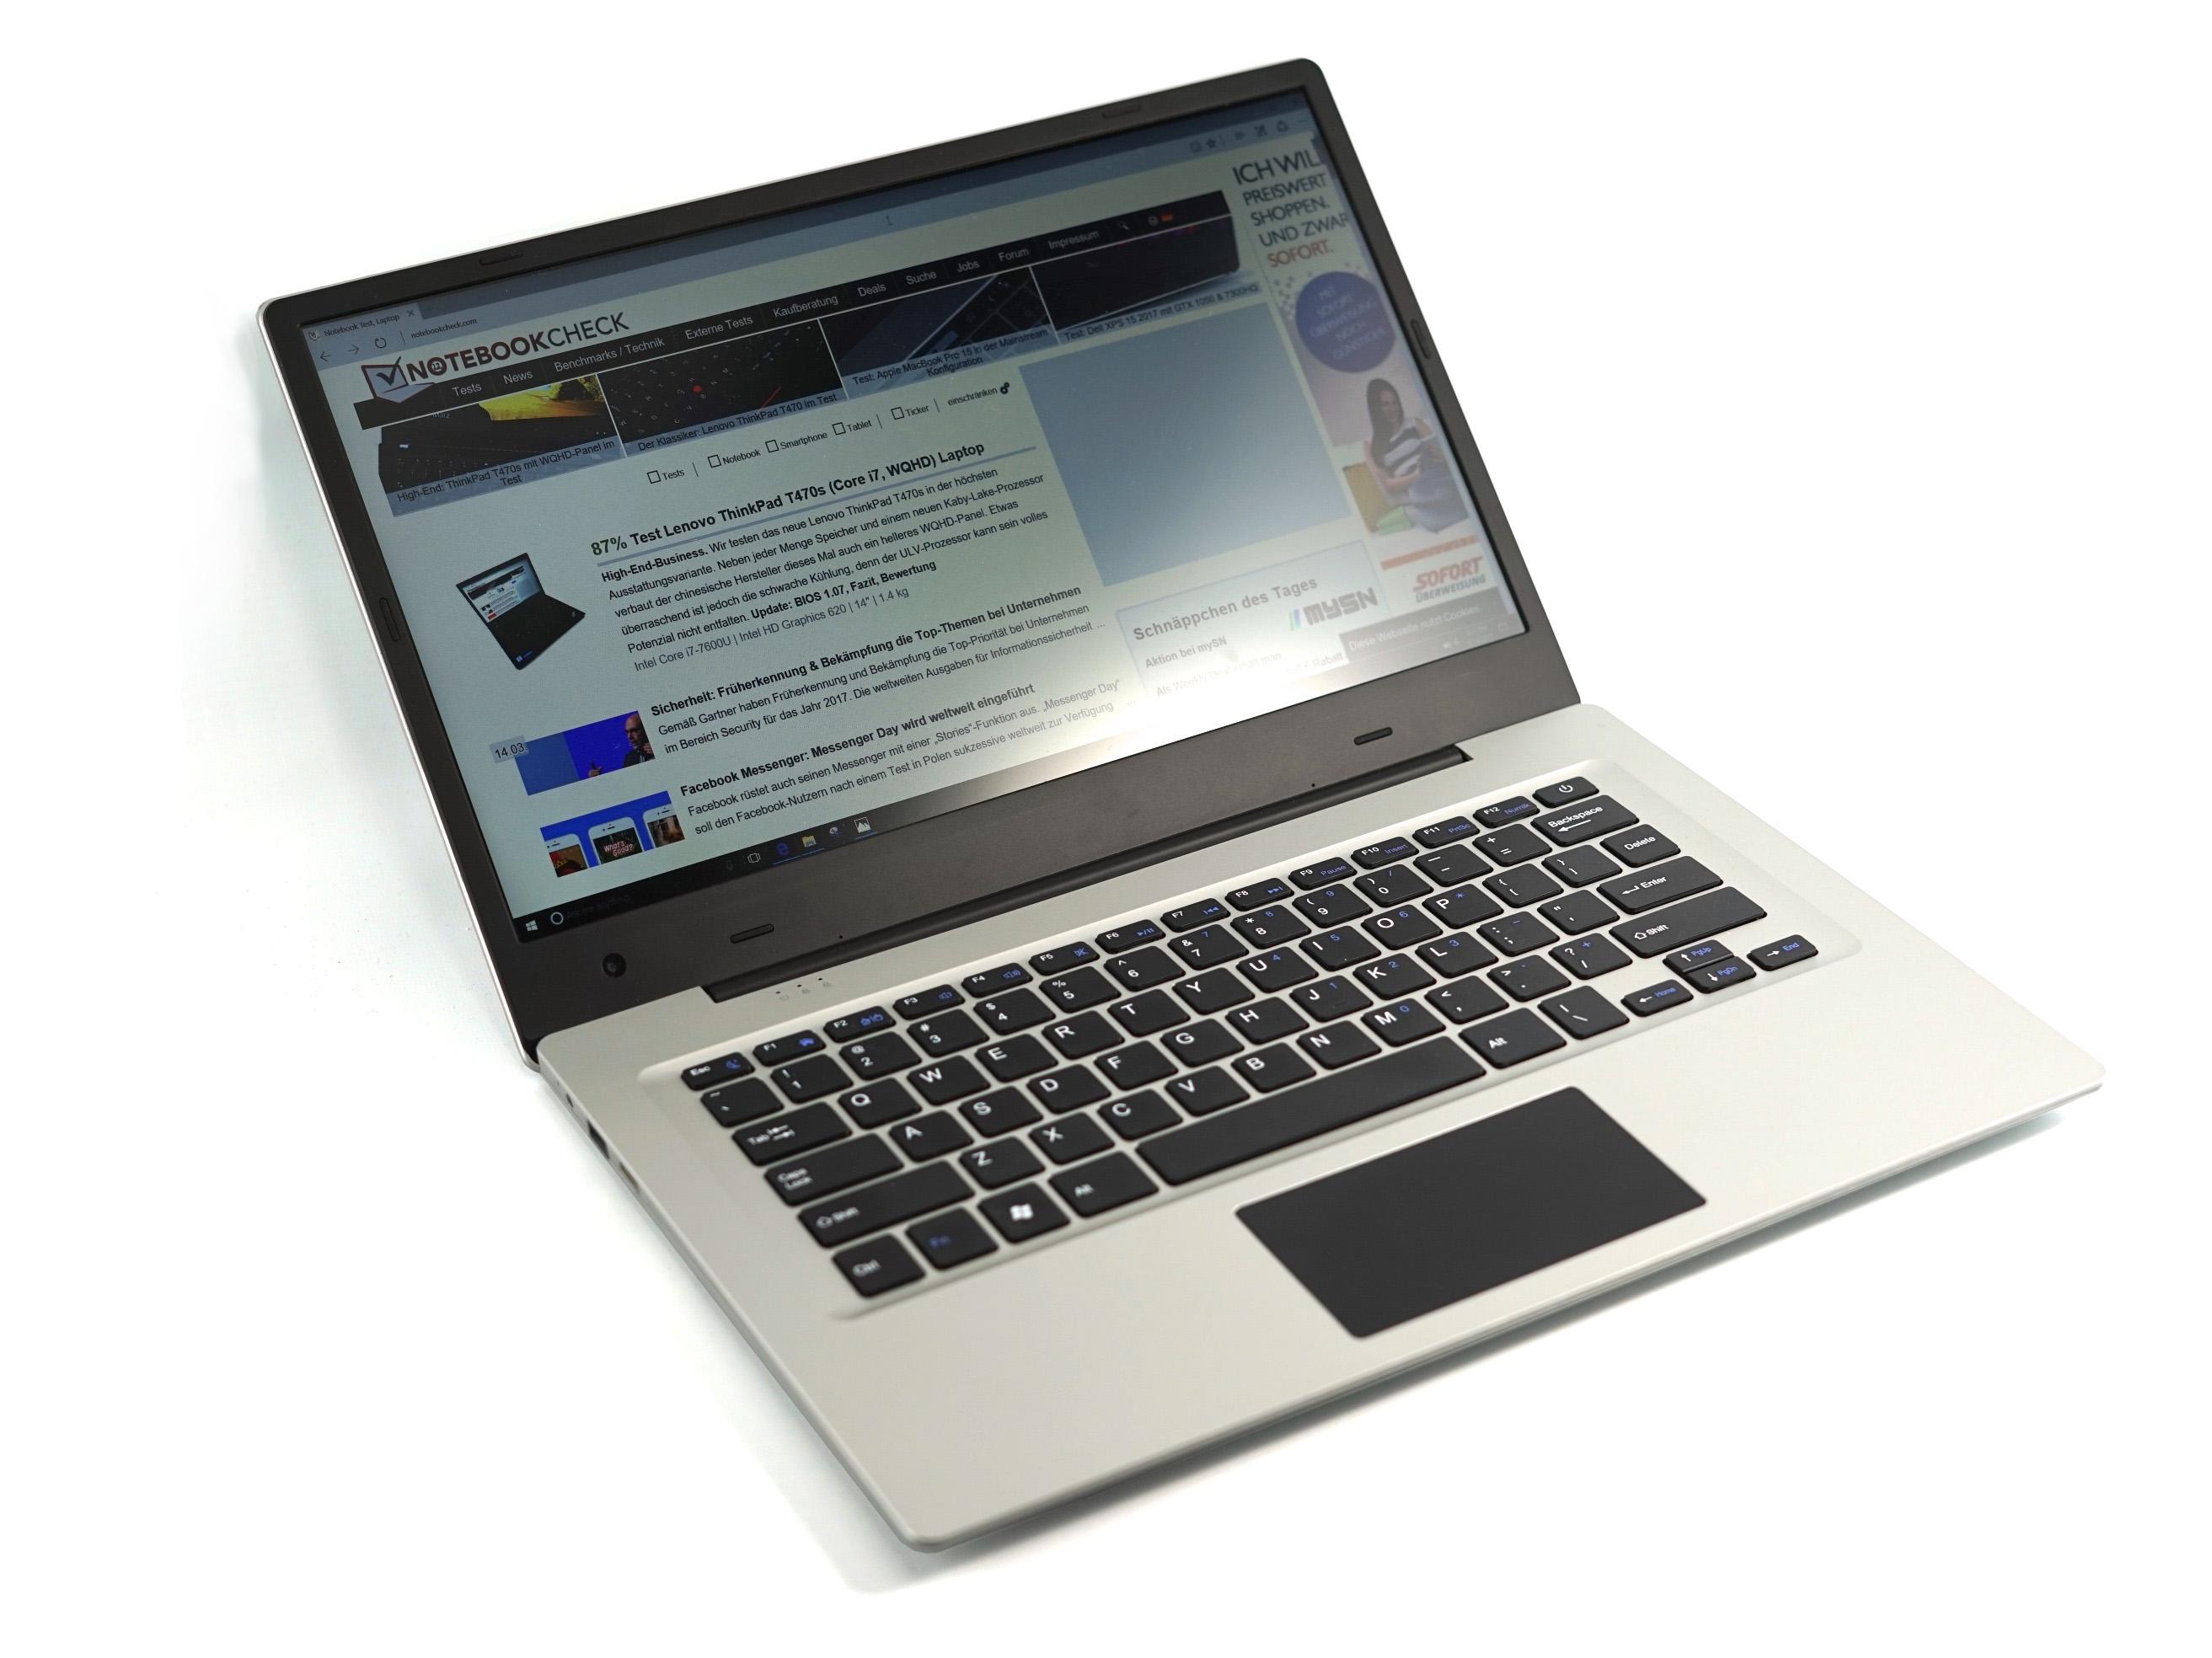 Jumper EZBook 3 (N3350, FHD) Laptop Review - NotebookCheck